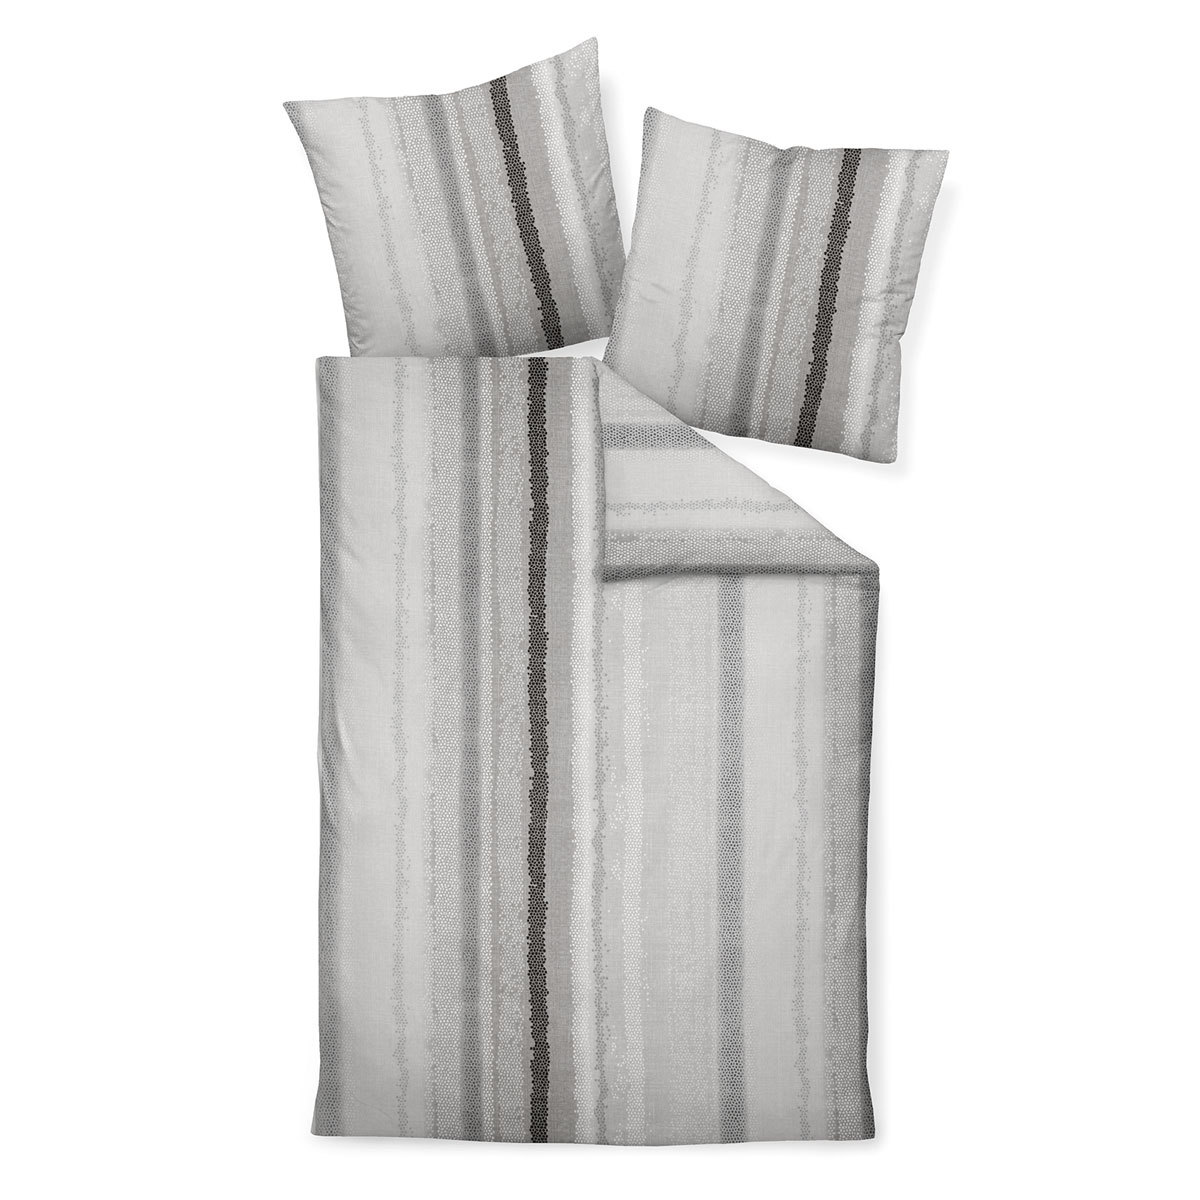 janine biber bettw sche davos 65042 08 platin taupe. Black Bedroom Furniture Sets. Home Design Ideas